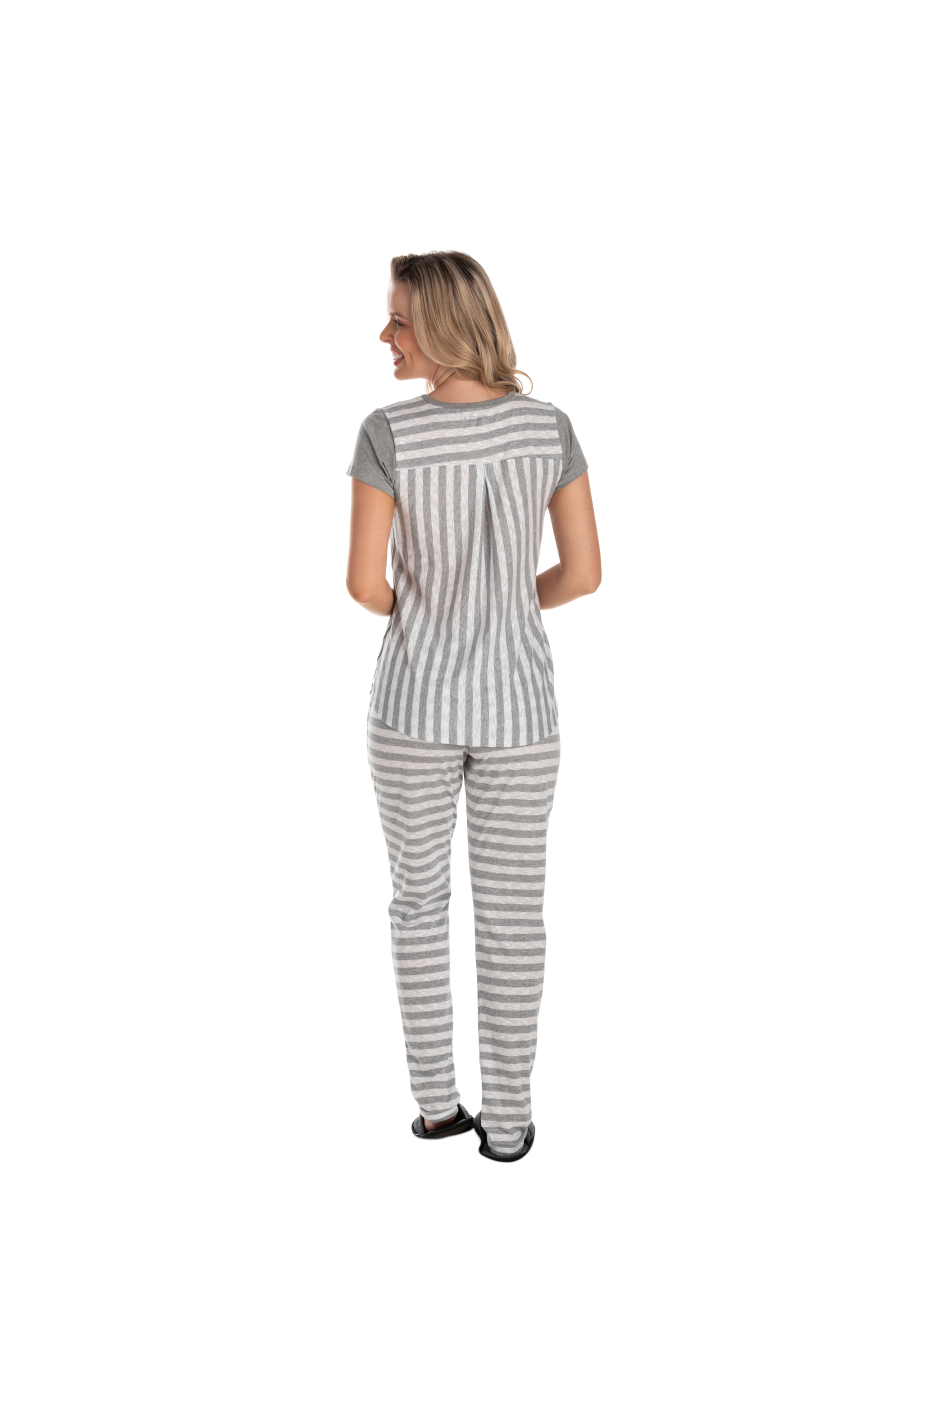 212/D - Pijama Adulto Feminino Curto Com Fio Flamê